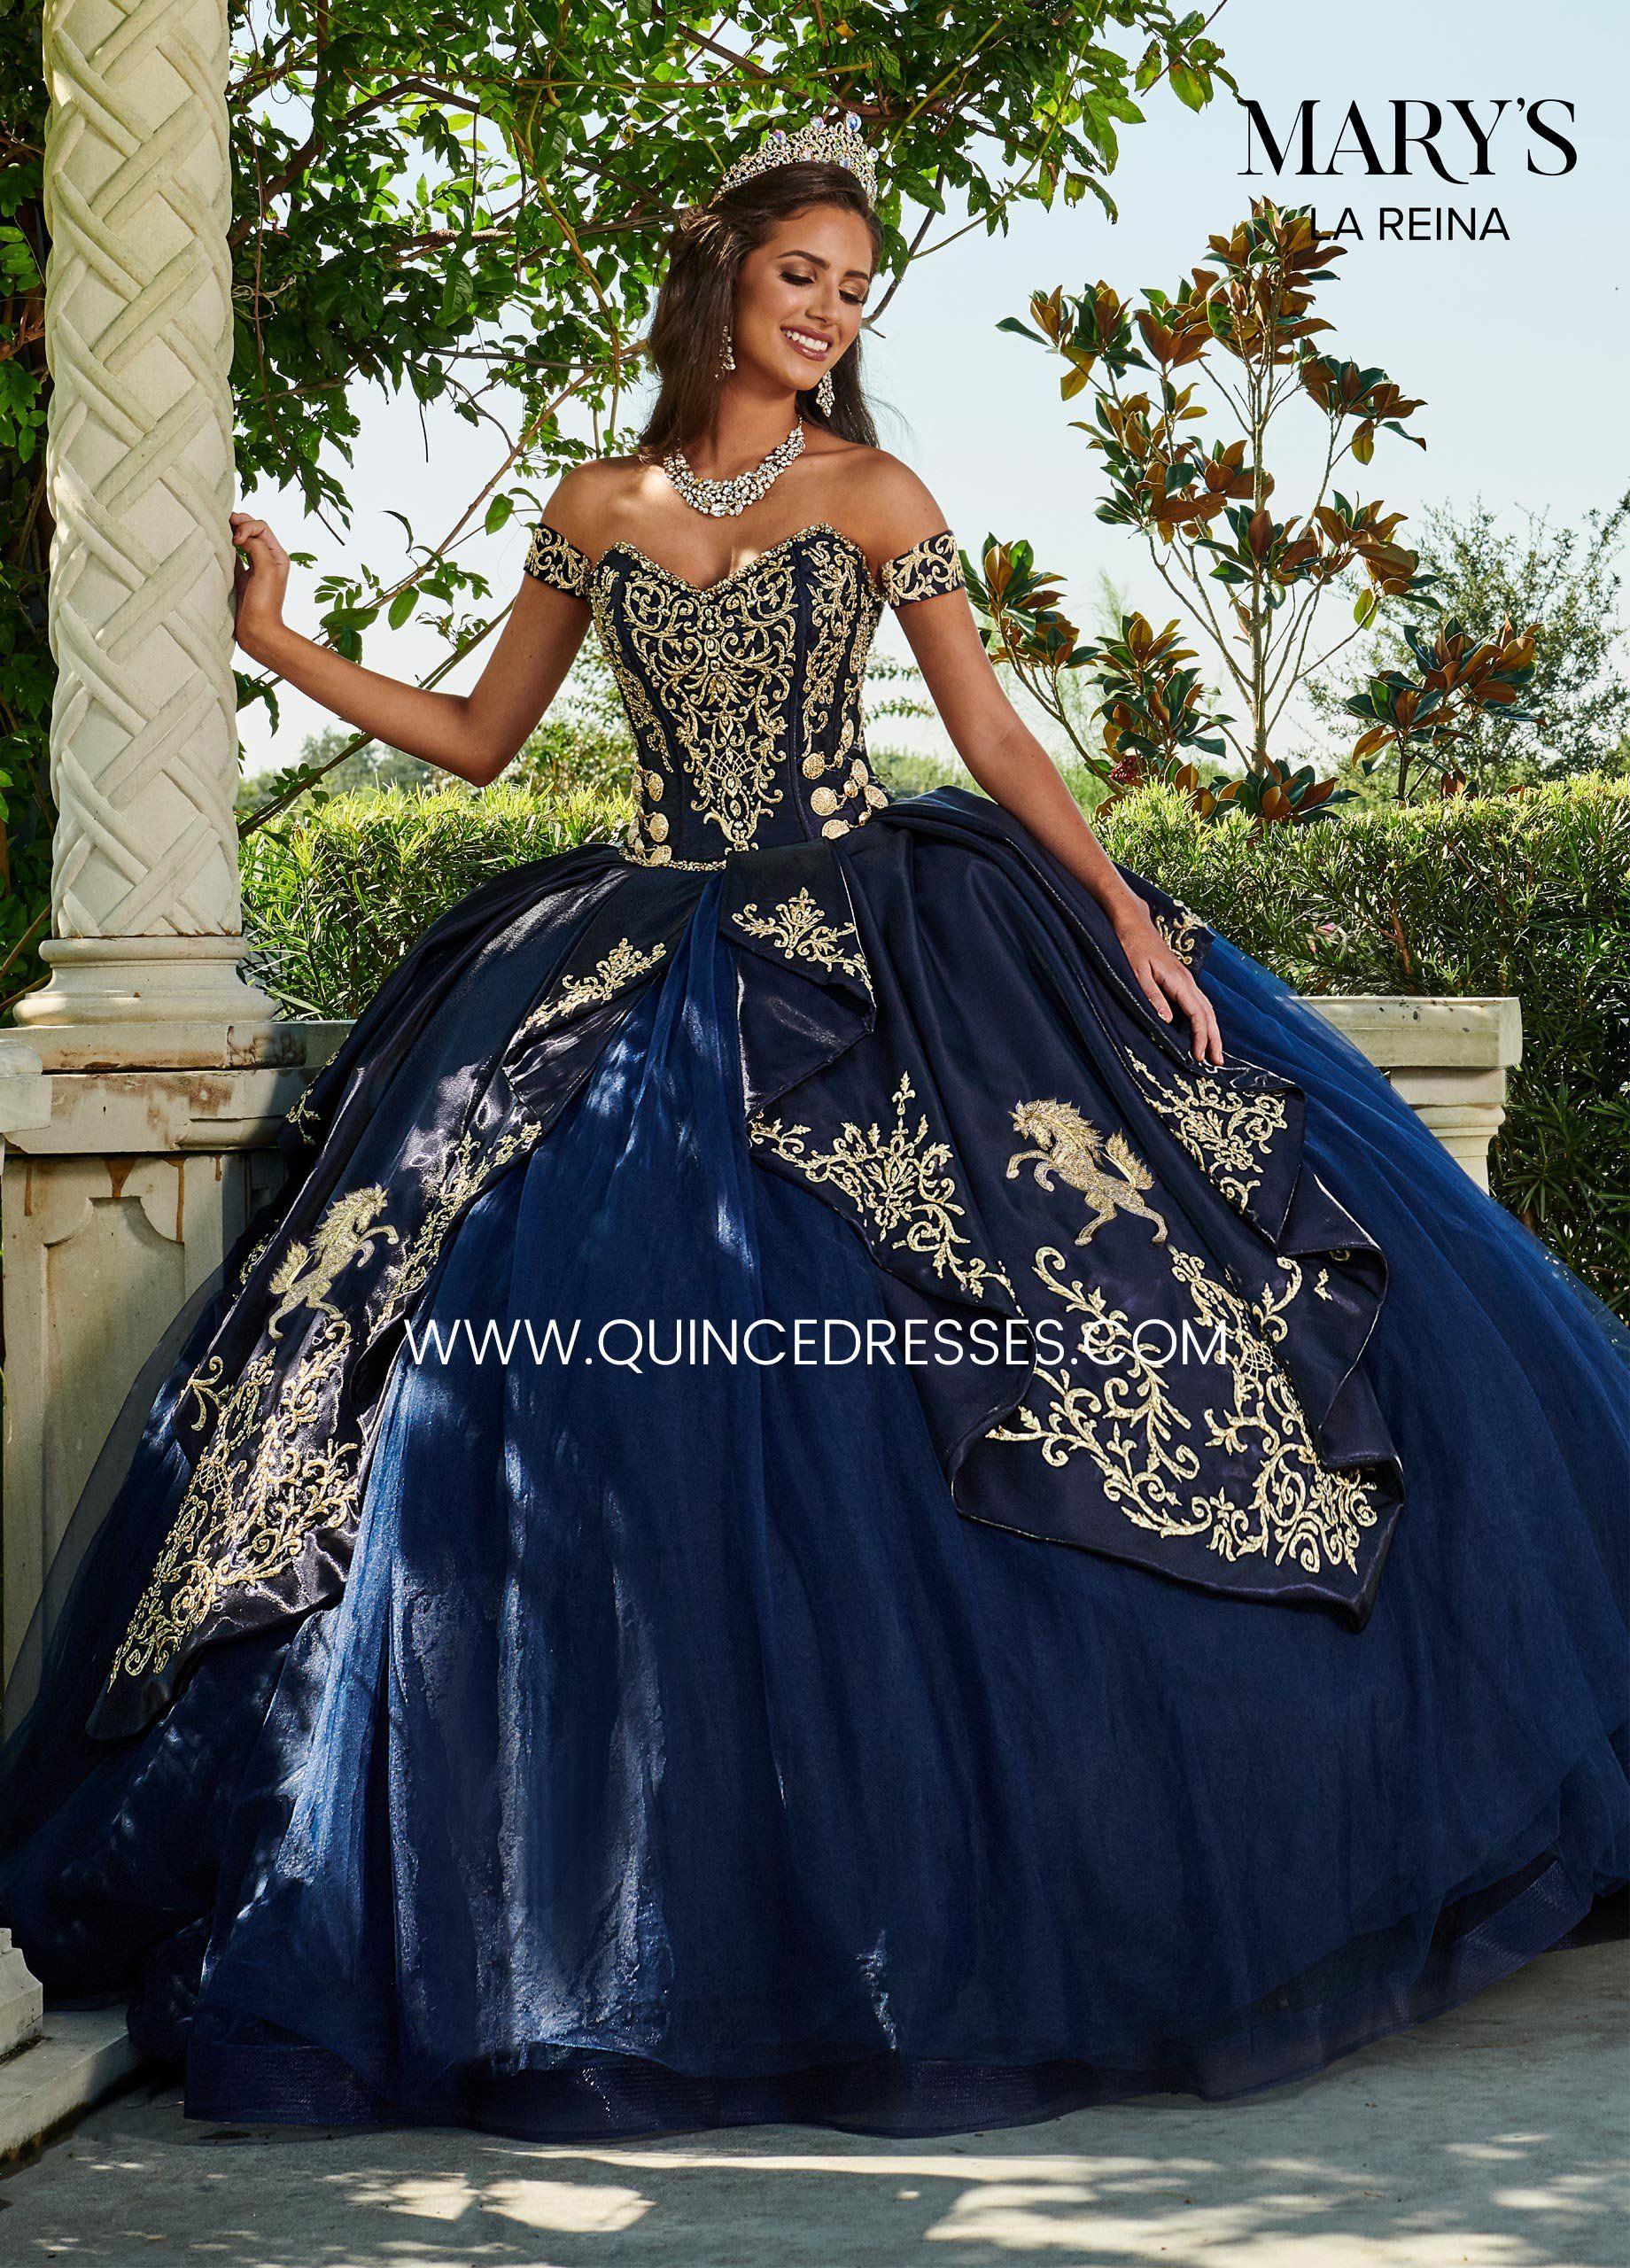 Mq2112 Marys Quinceanera In 2021 Quinceanera Dresses Blue Quince Dresses Mexican Charro Quinceanera Dresses [ 2560 x 1840 Pixel ]